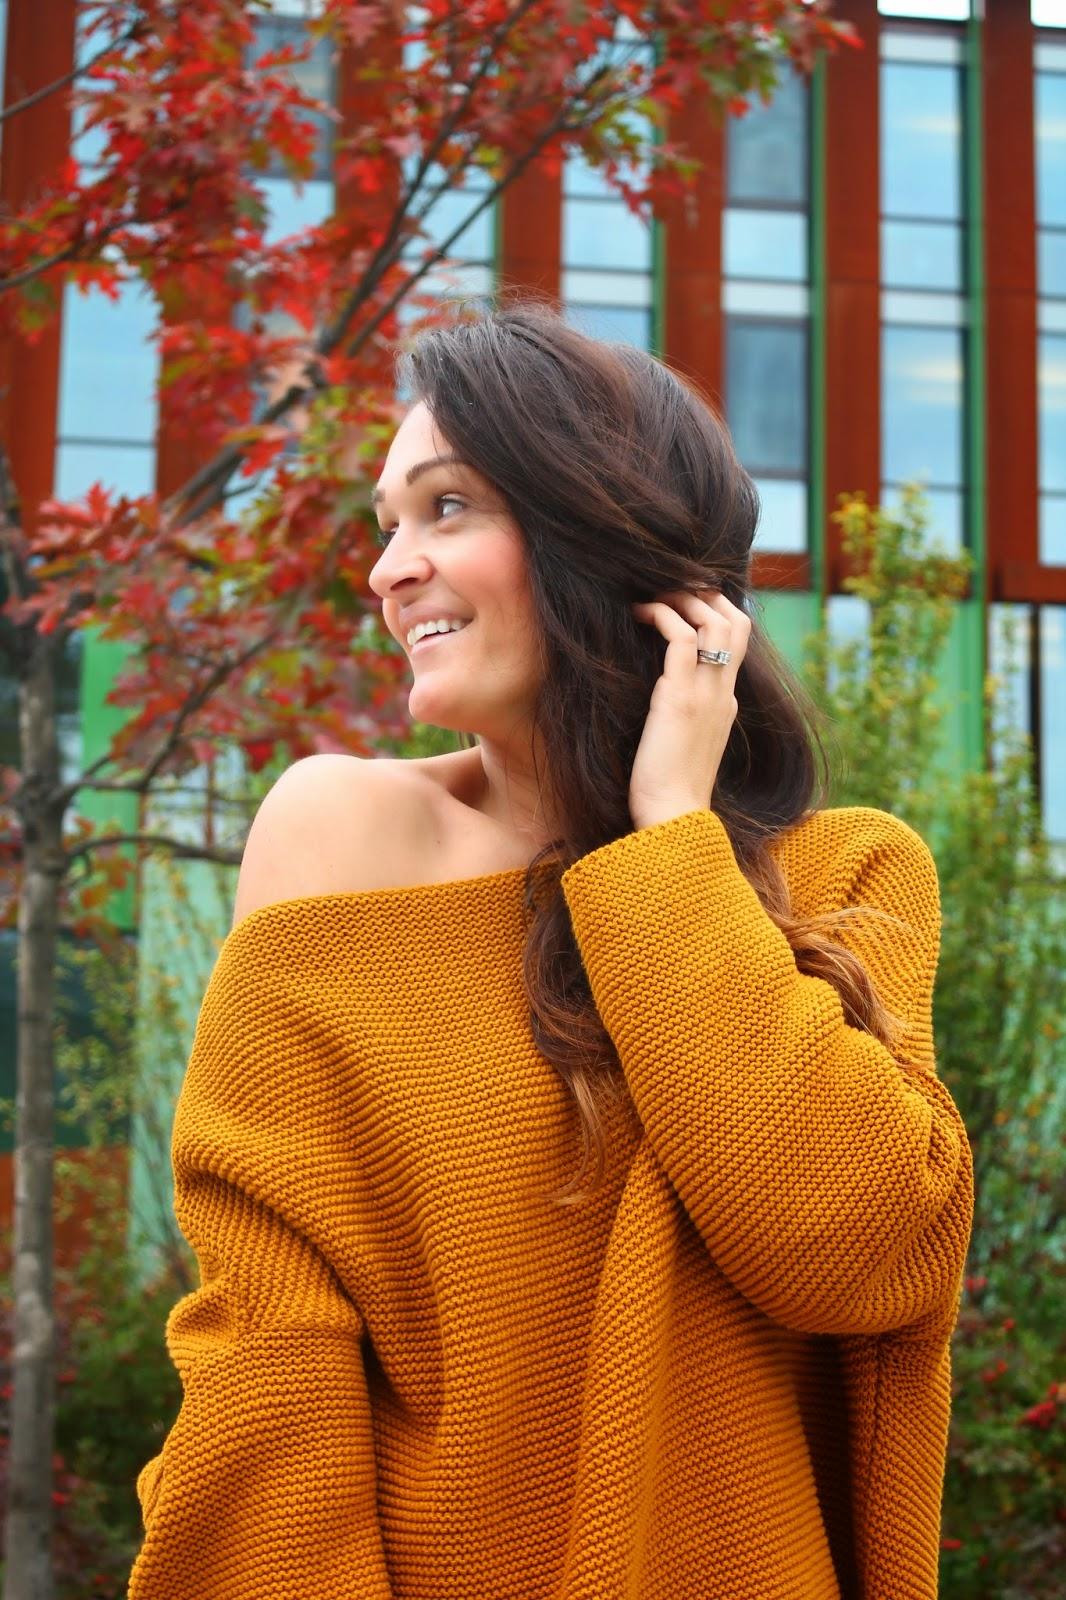 Oversized sweater, zara sweater, fall trend, fall sweater, blogerke, dzemper, toronto fashion blogger, toronto street style